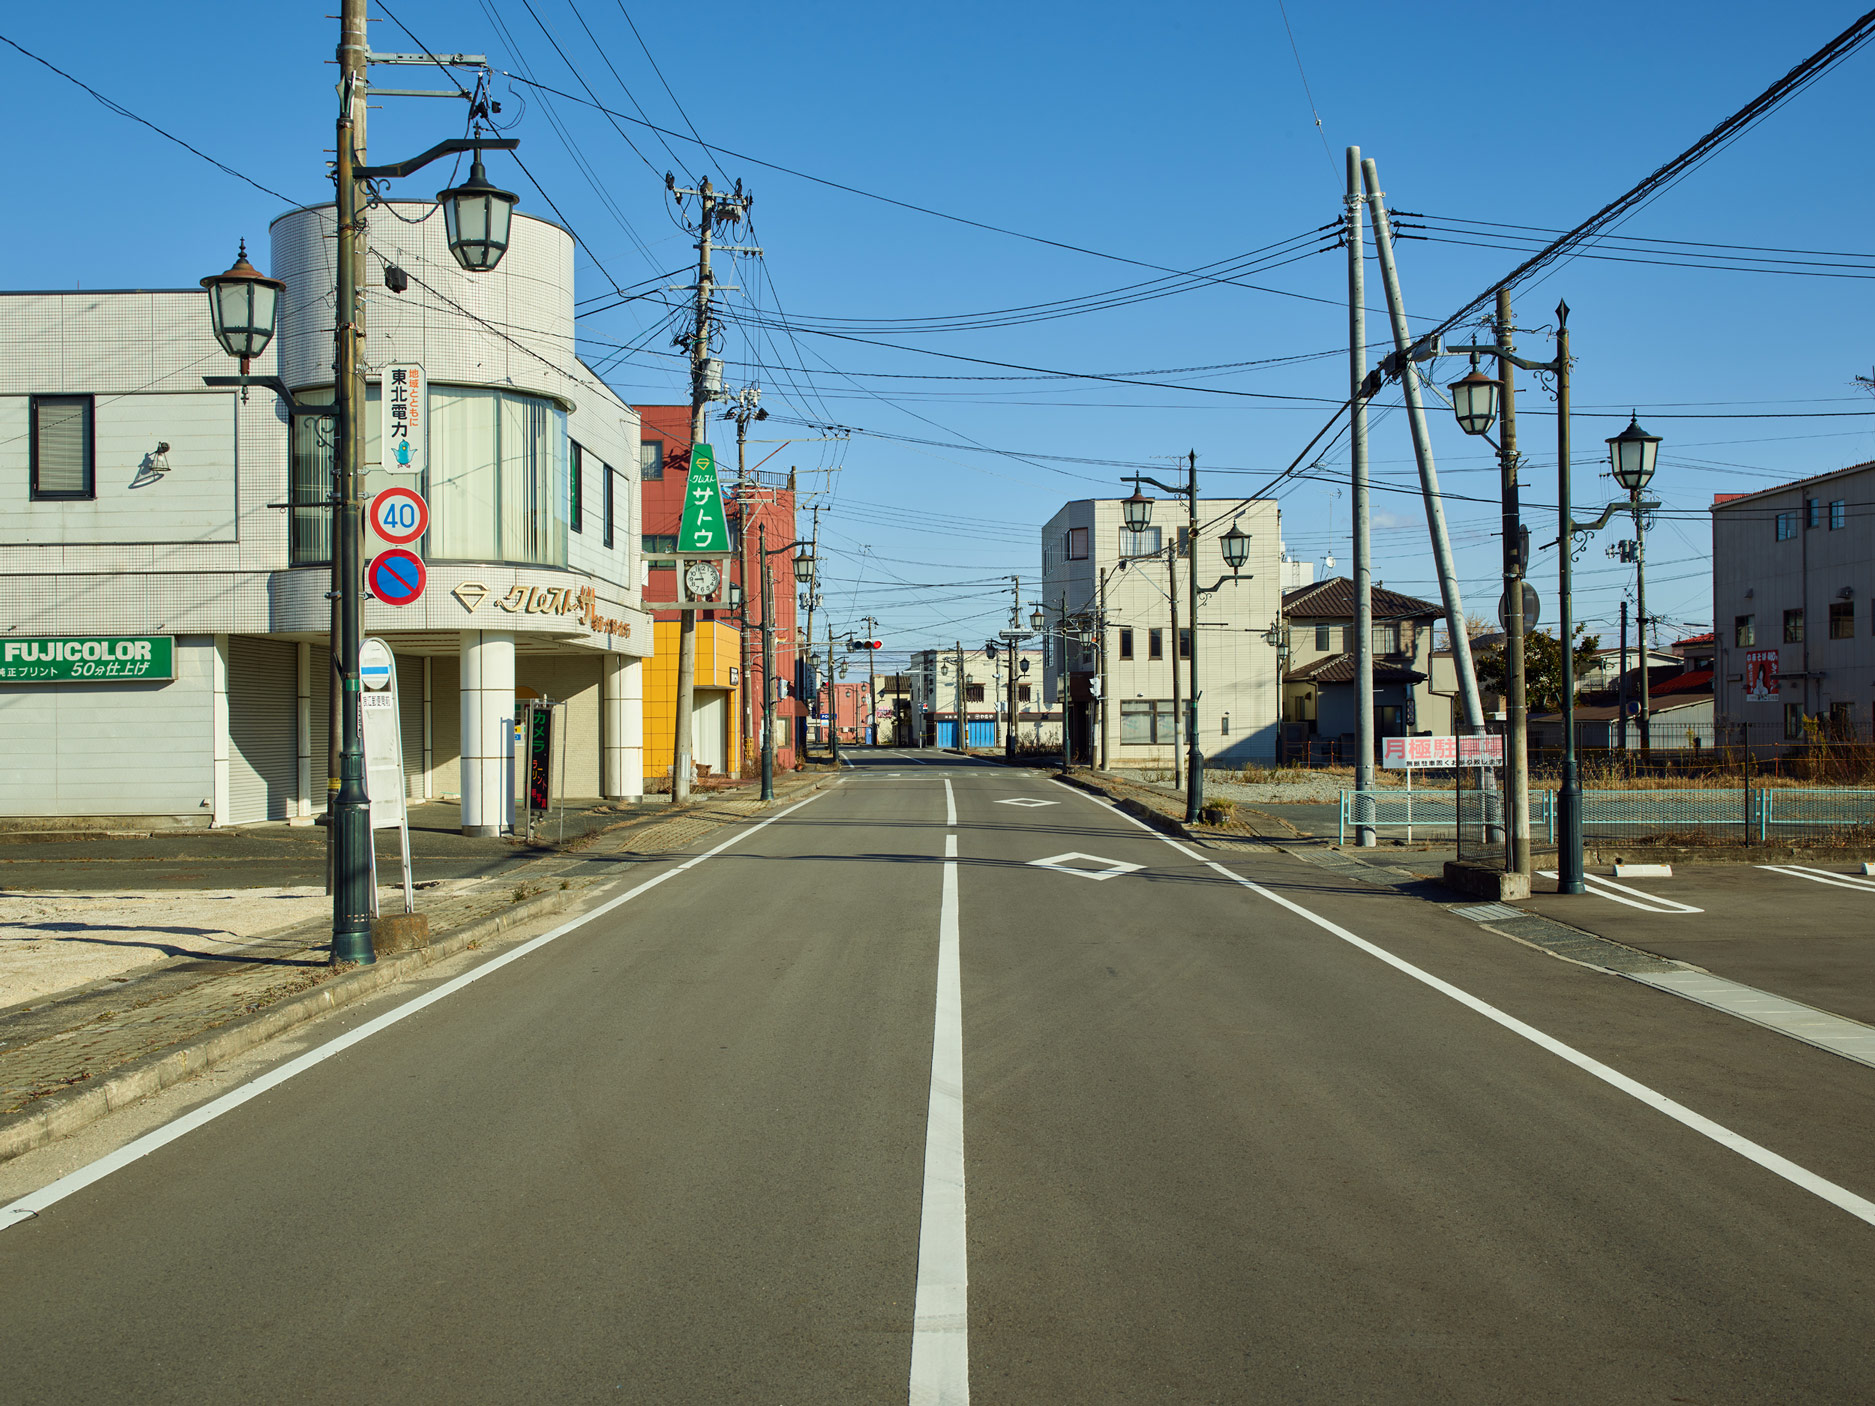 Futuba District, Fukushima, Japan, 2017